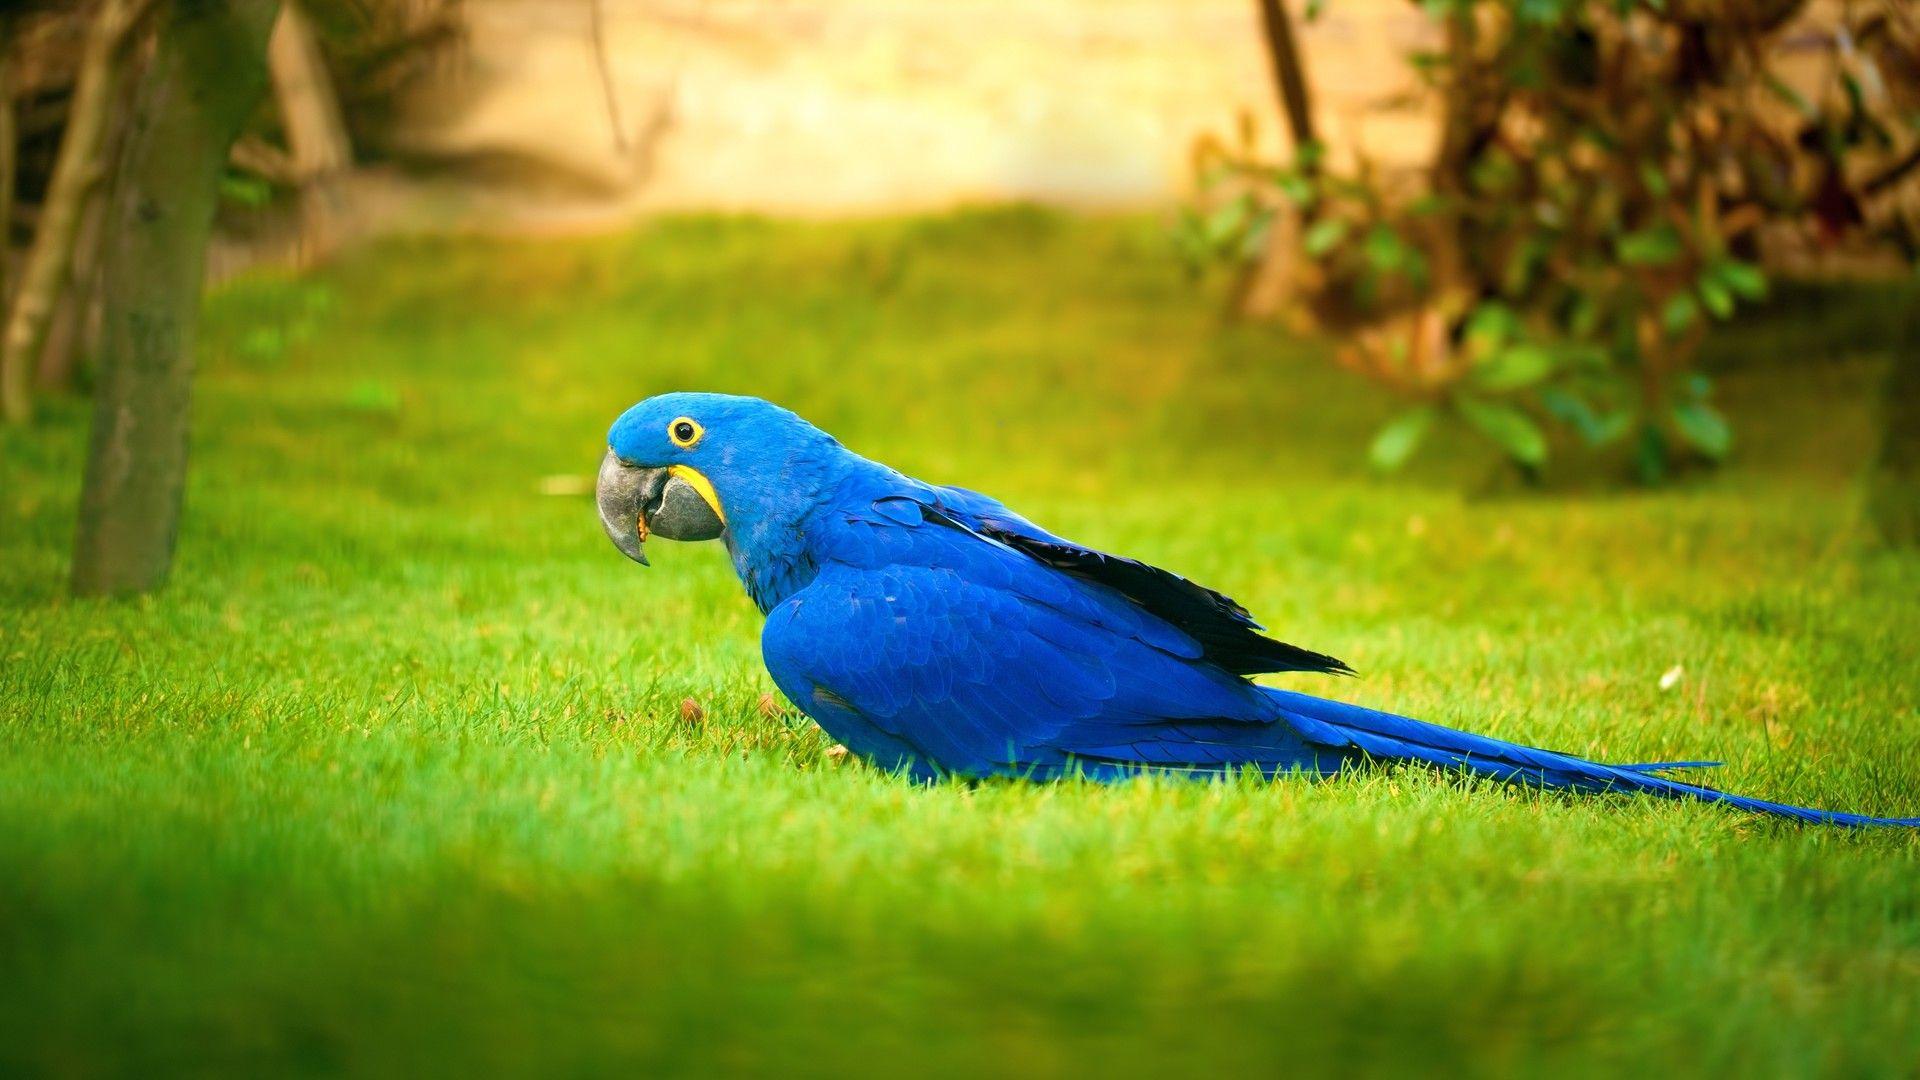 birds parrot image